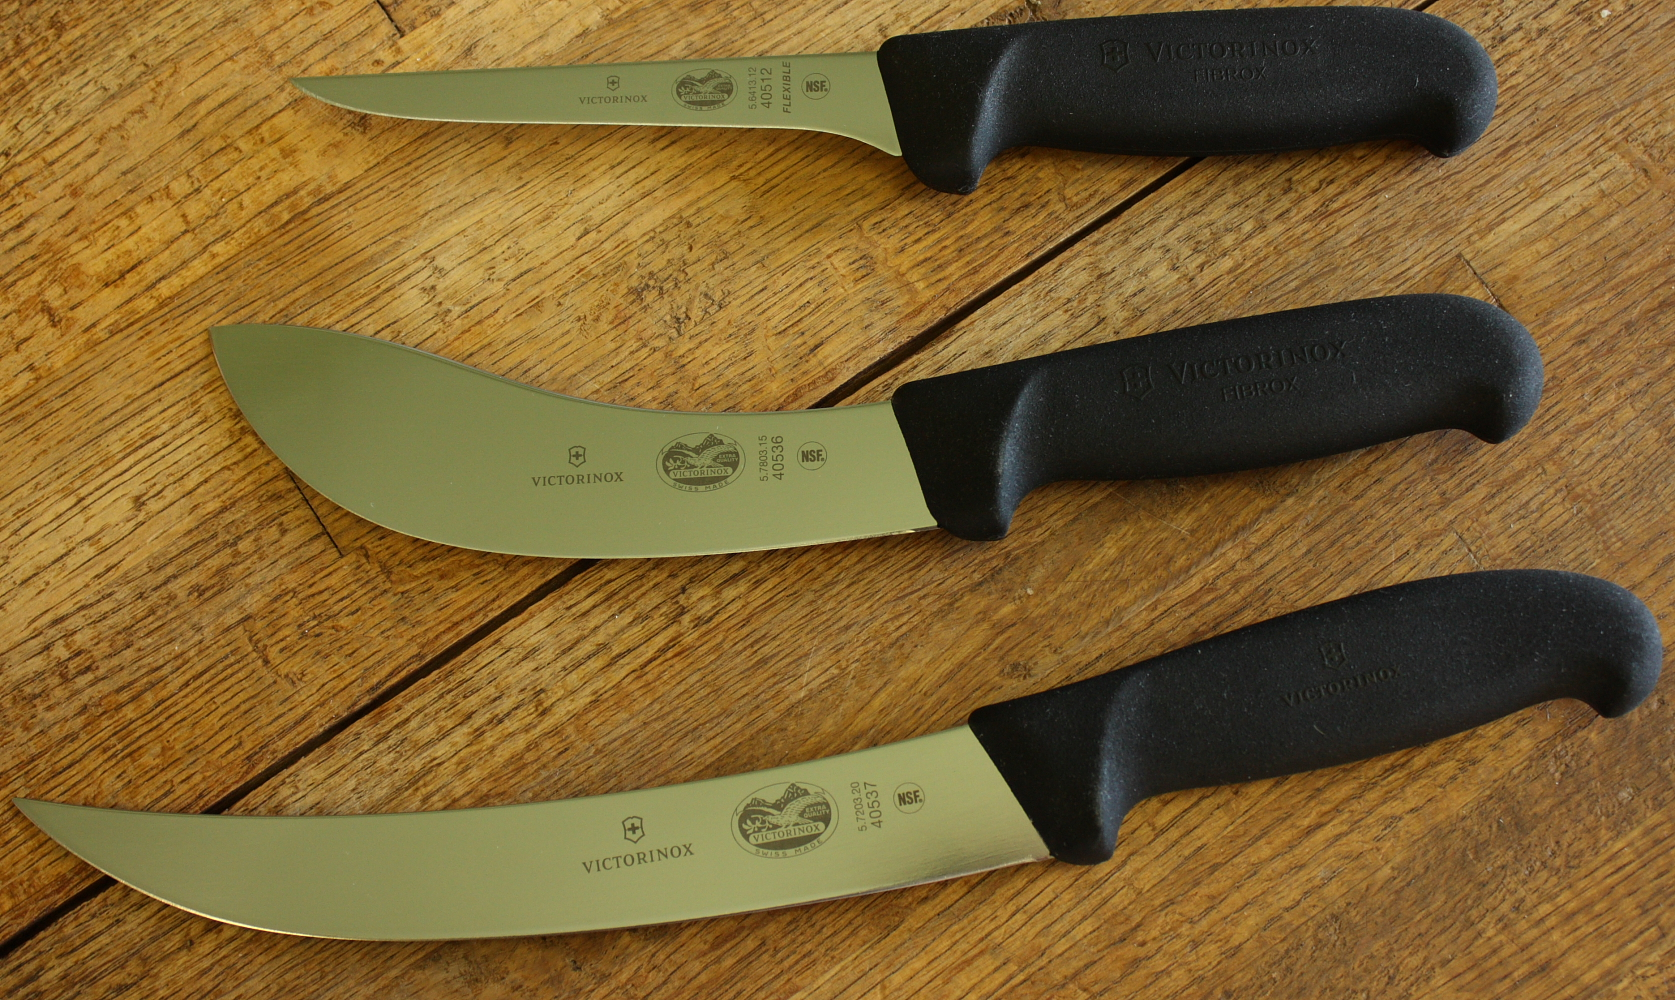 forschner victorinox 3 25 inch paring knives